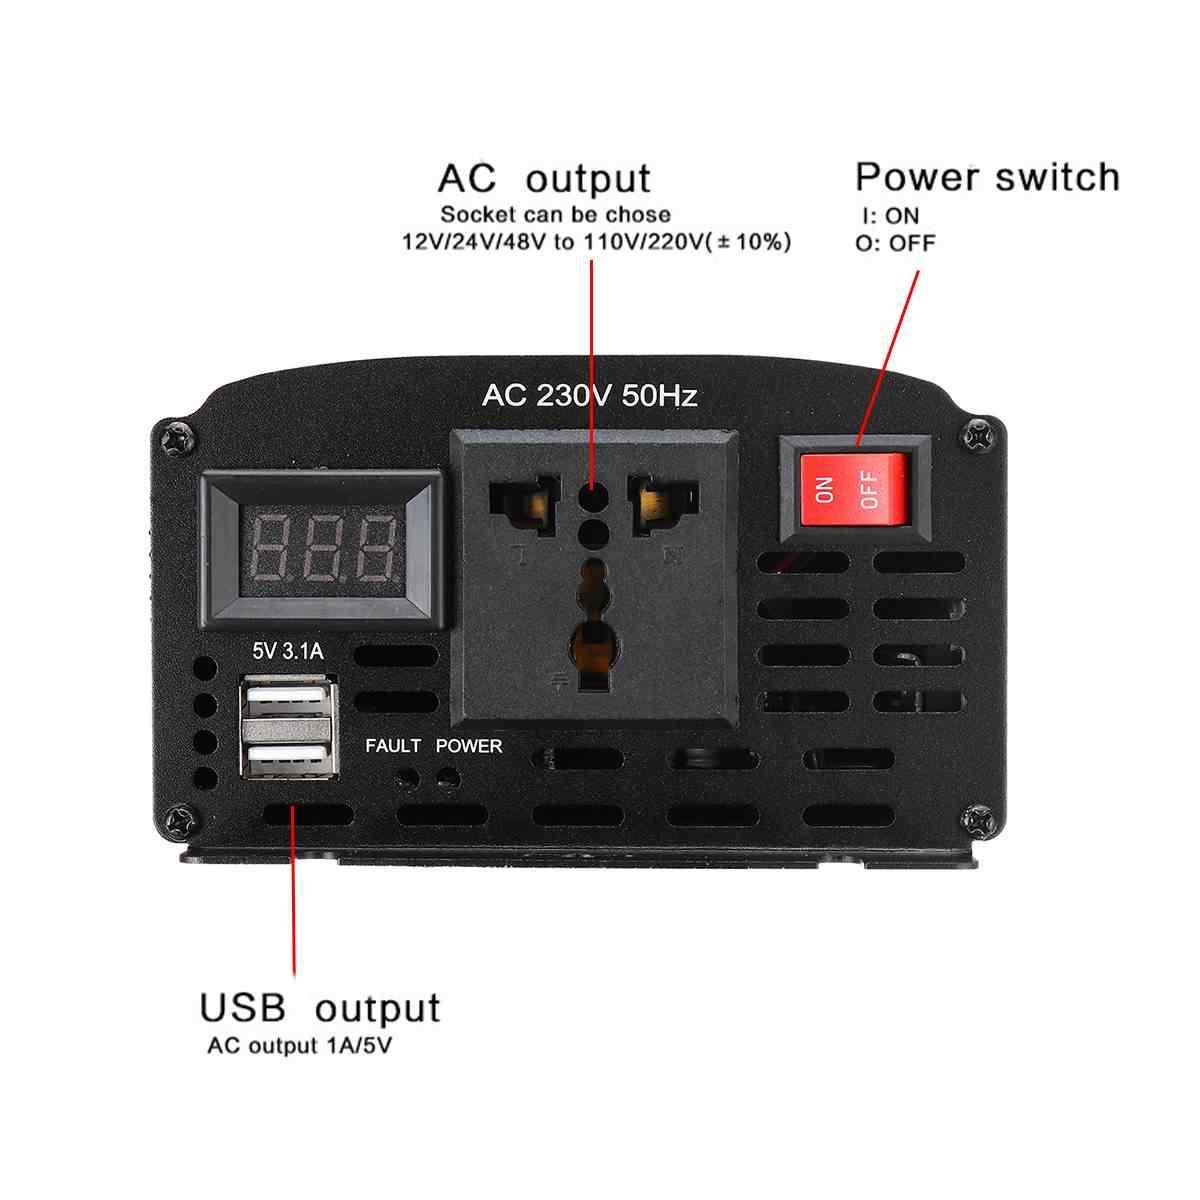 Invertör 12000W/10000W DC 12V için AC 220V çift USB araba güç invertörü şarj dönüştürücü adaptör modifiye sinüs dalgası trafo